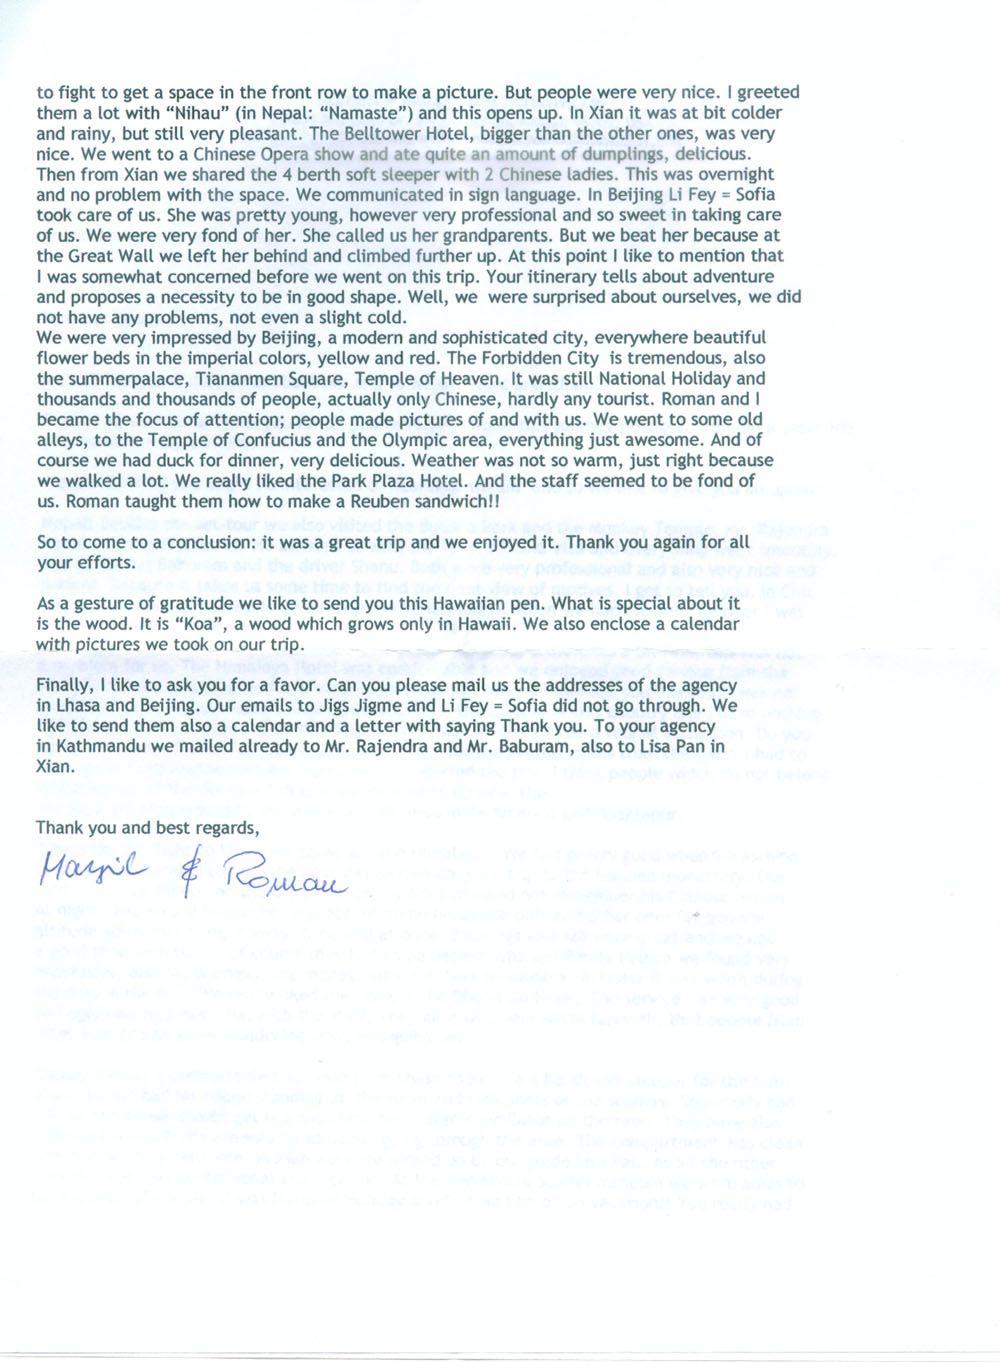 the longest thank you letter tibet travel blog appreciation